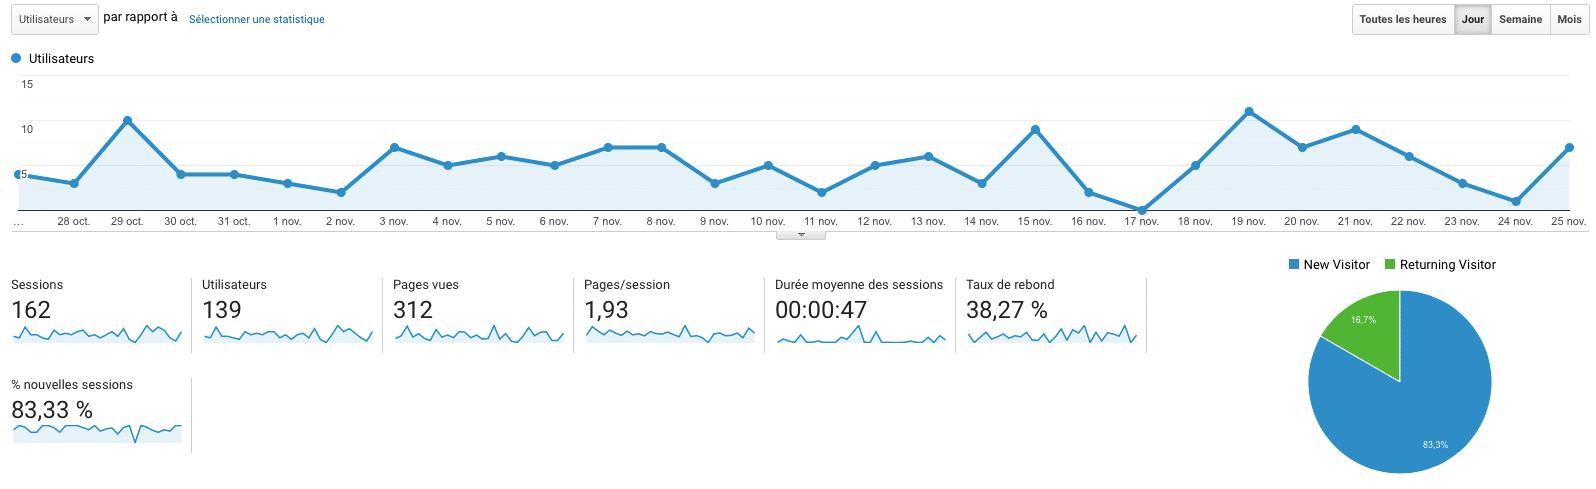 Statistiques Google Analytics - utilisateurs